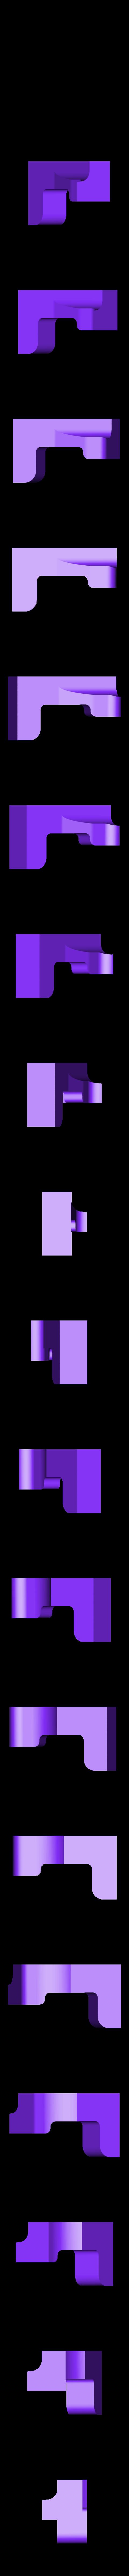 Front_Engine_-_Part_6-arm_4.STL Download free STL file 4-8-8-4 Big Boy Locomotive • 3D printer object, RaymondDeLuca